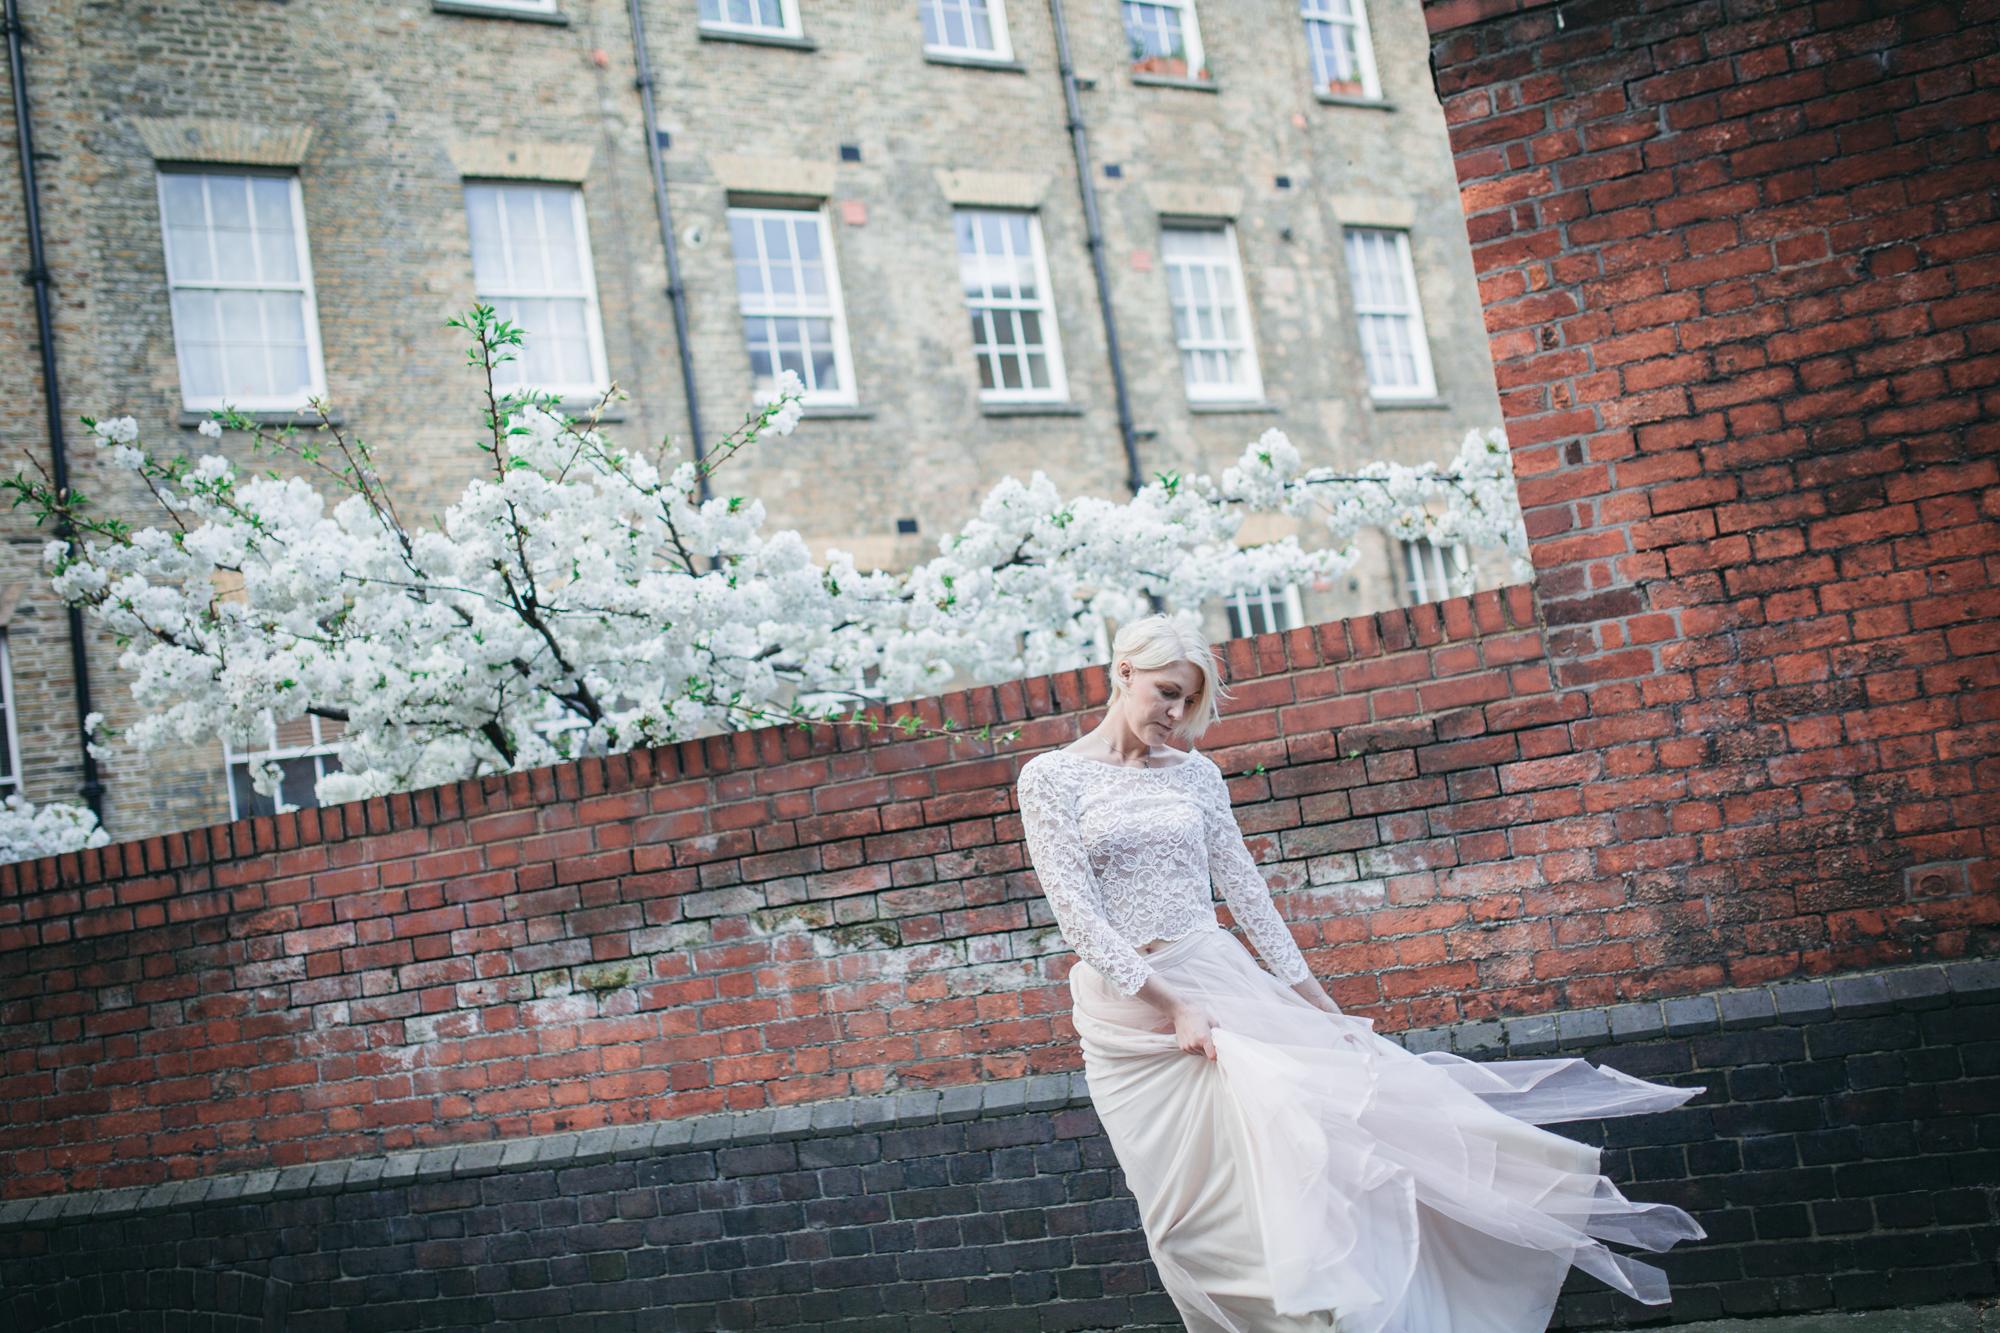 weddingphotographer_lindarehlin_preweddingphoto_london_SensibleM-89.jpg